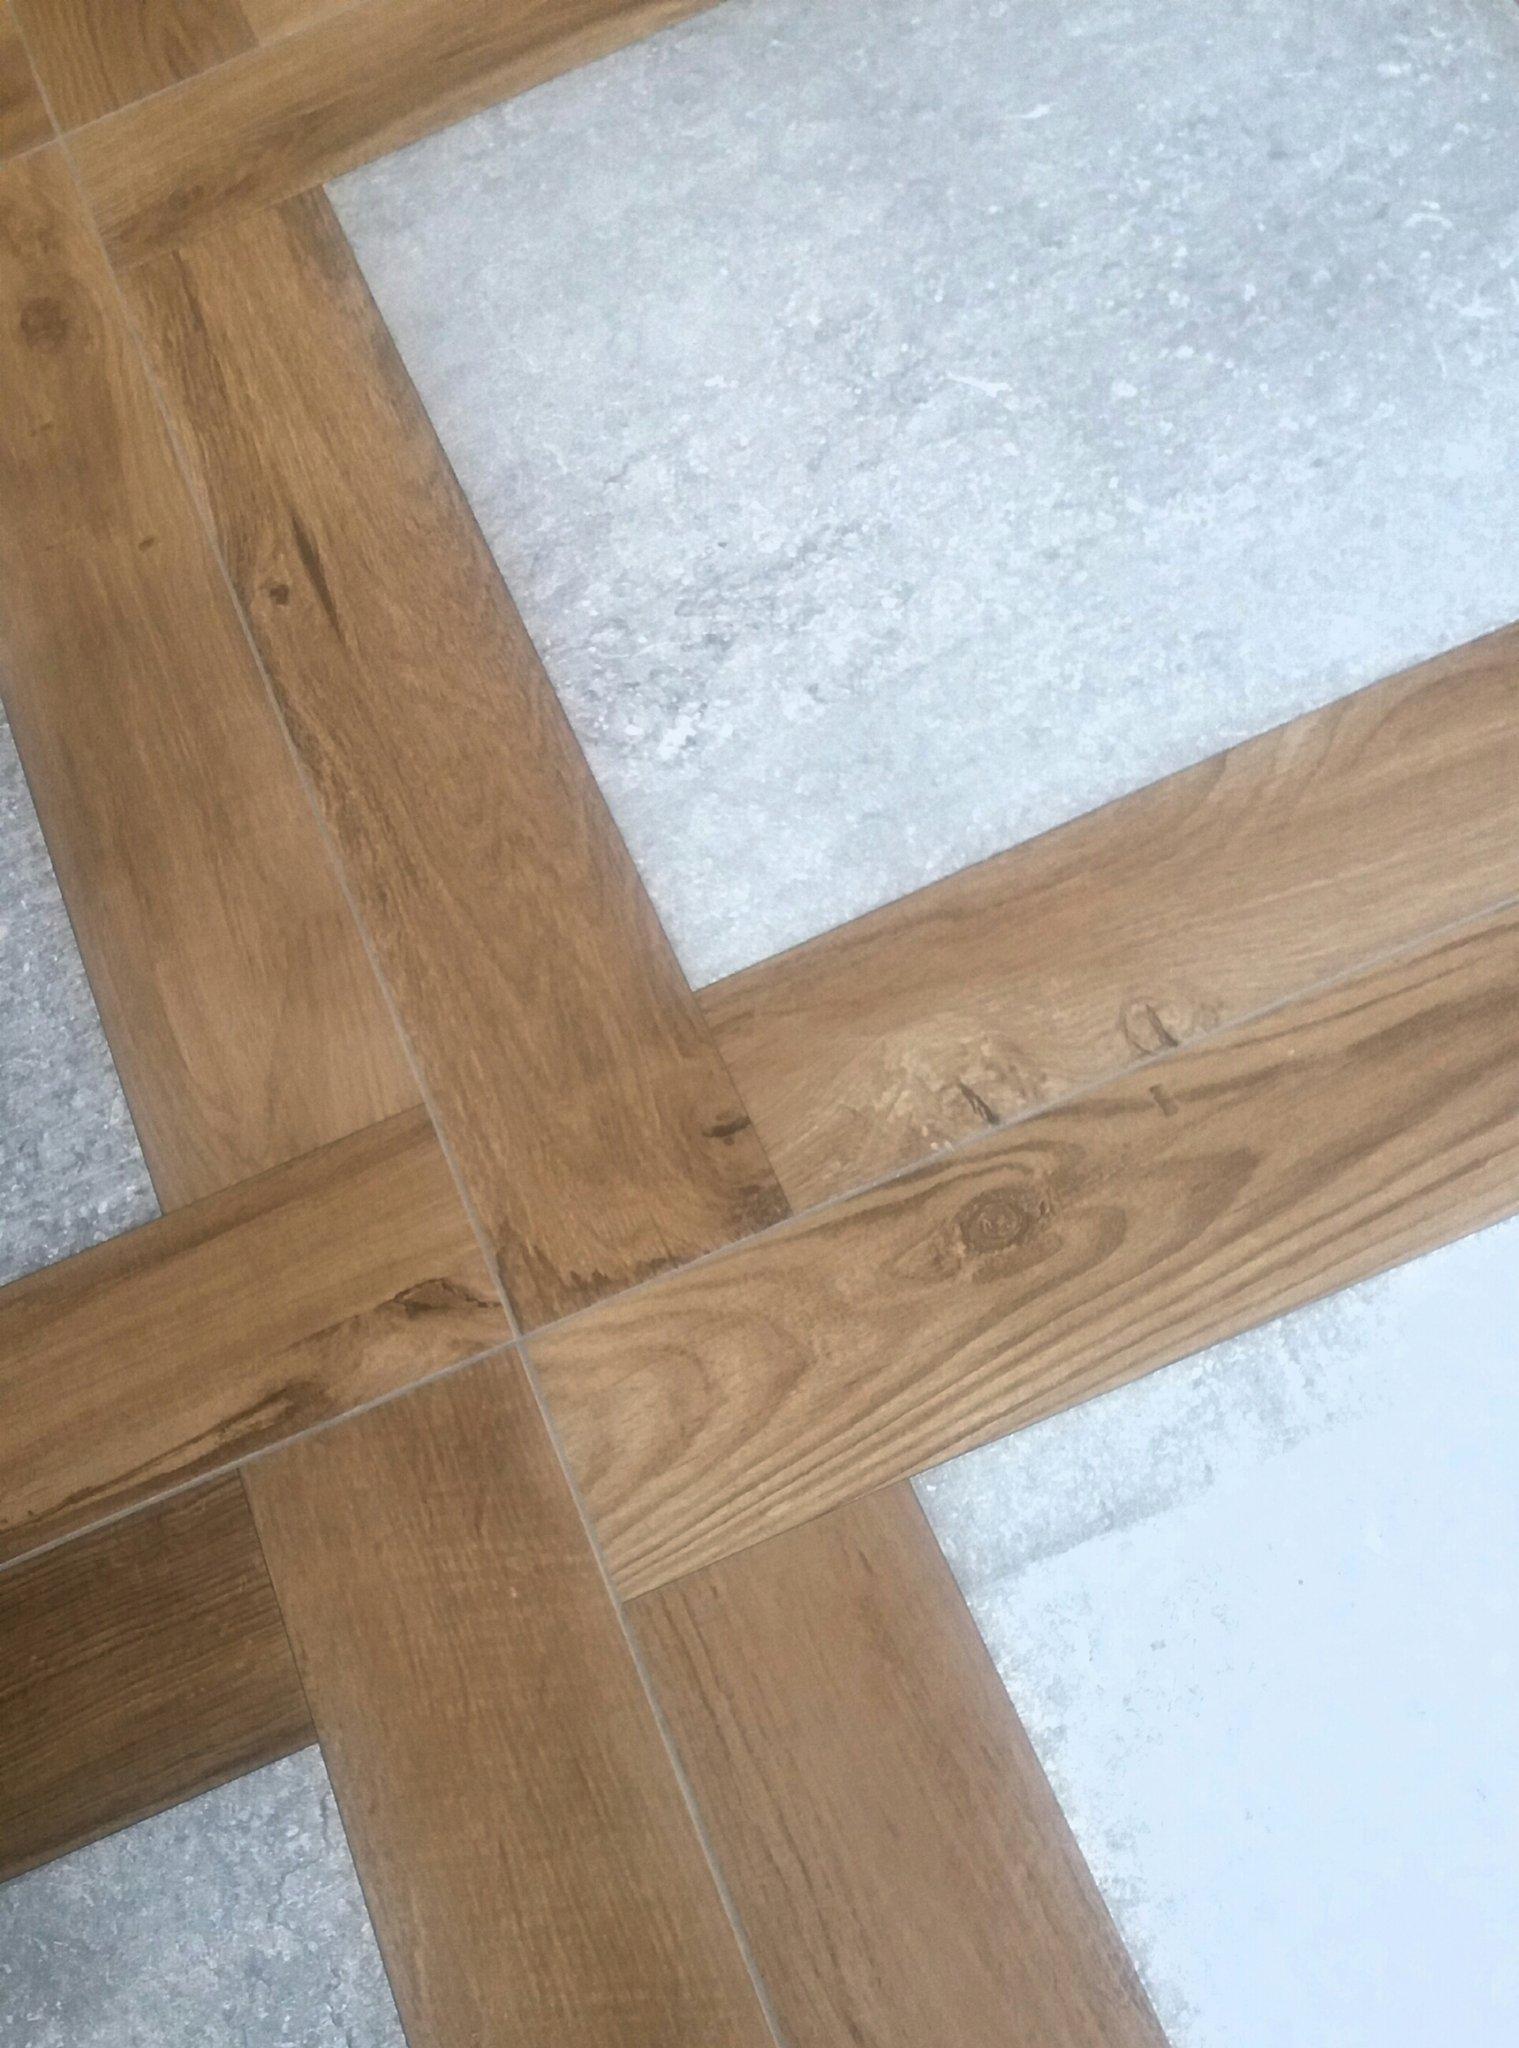 Trampantojo! Parece madera, pero solo parece... #PorcelanosaExperience https://t.co/QGXYs9VMLY